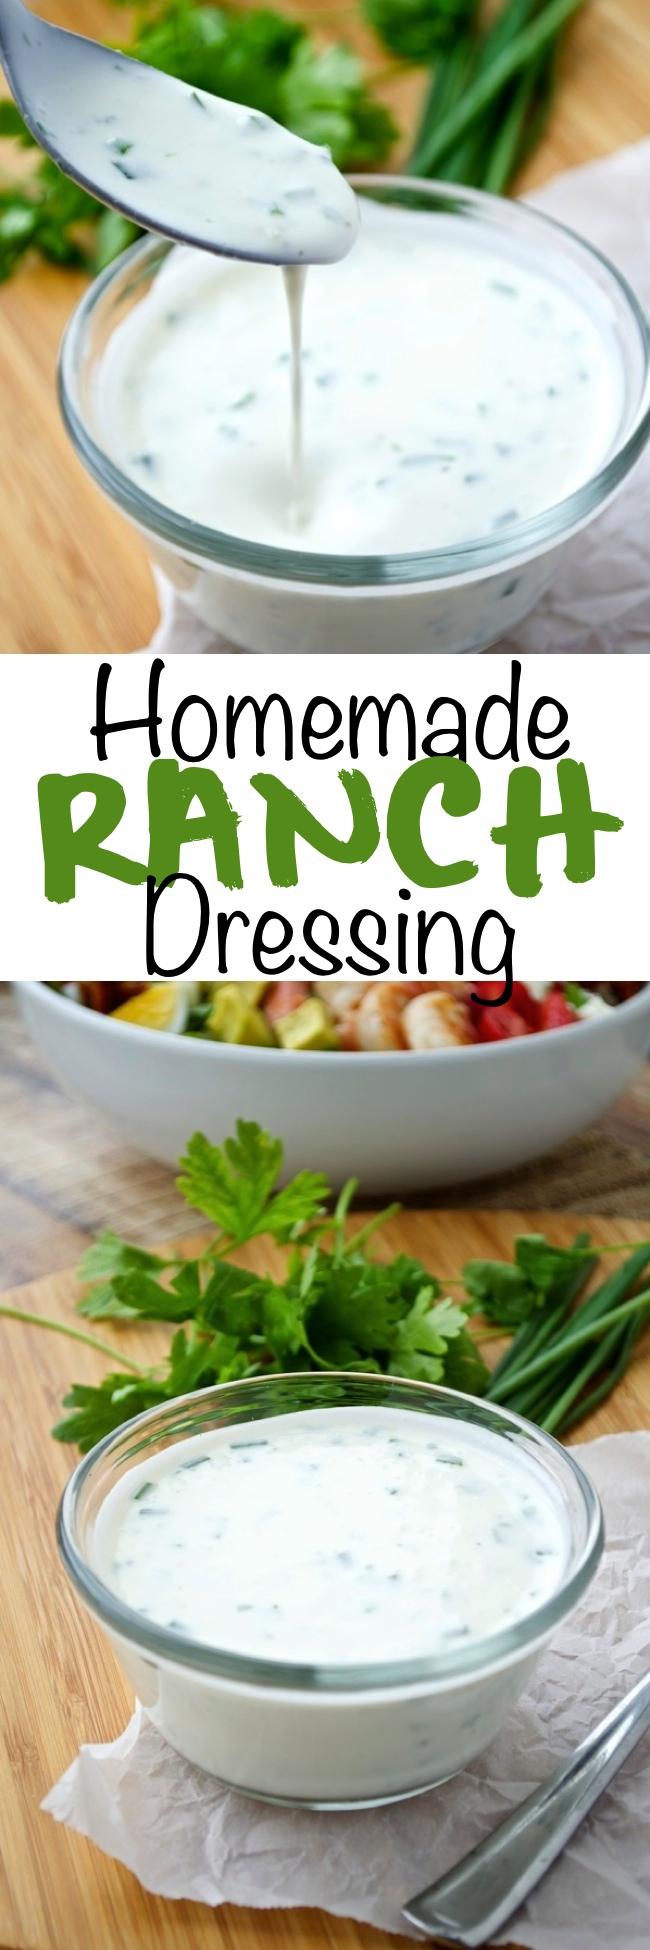 Homemade Ranch Dressing Pin